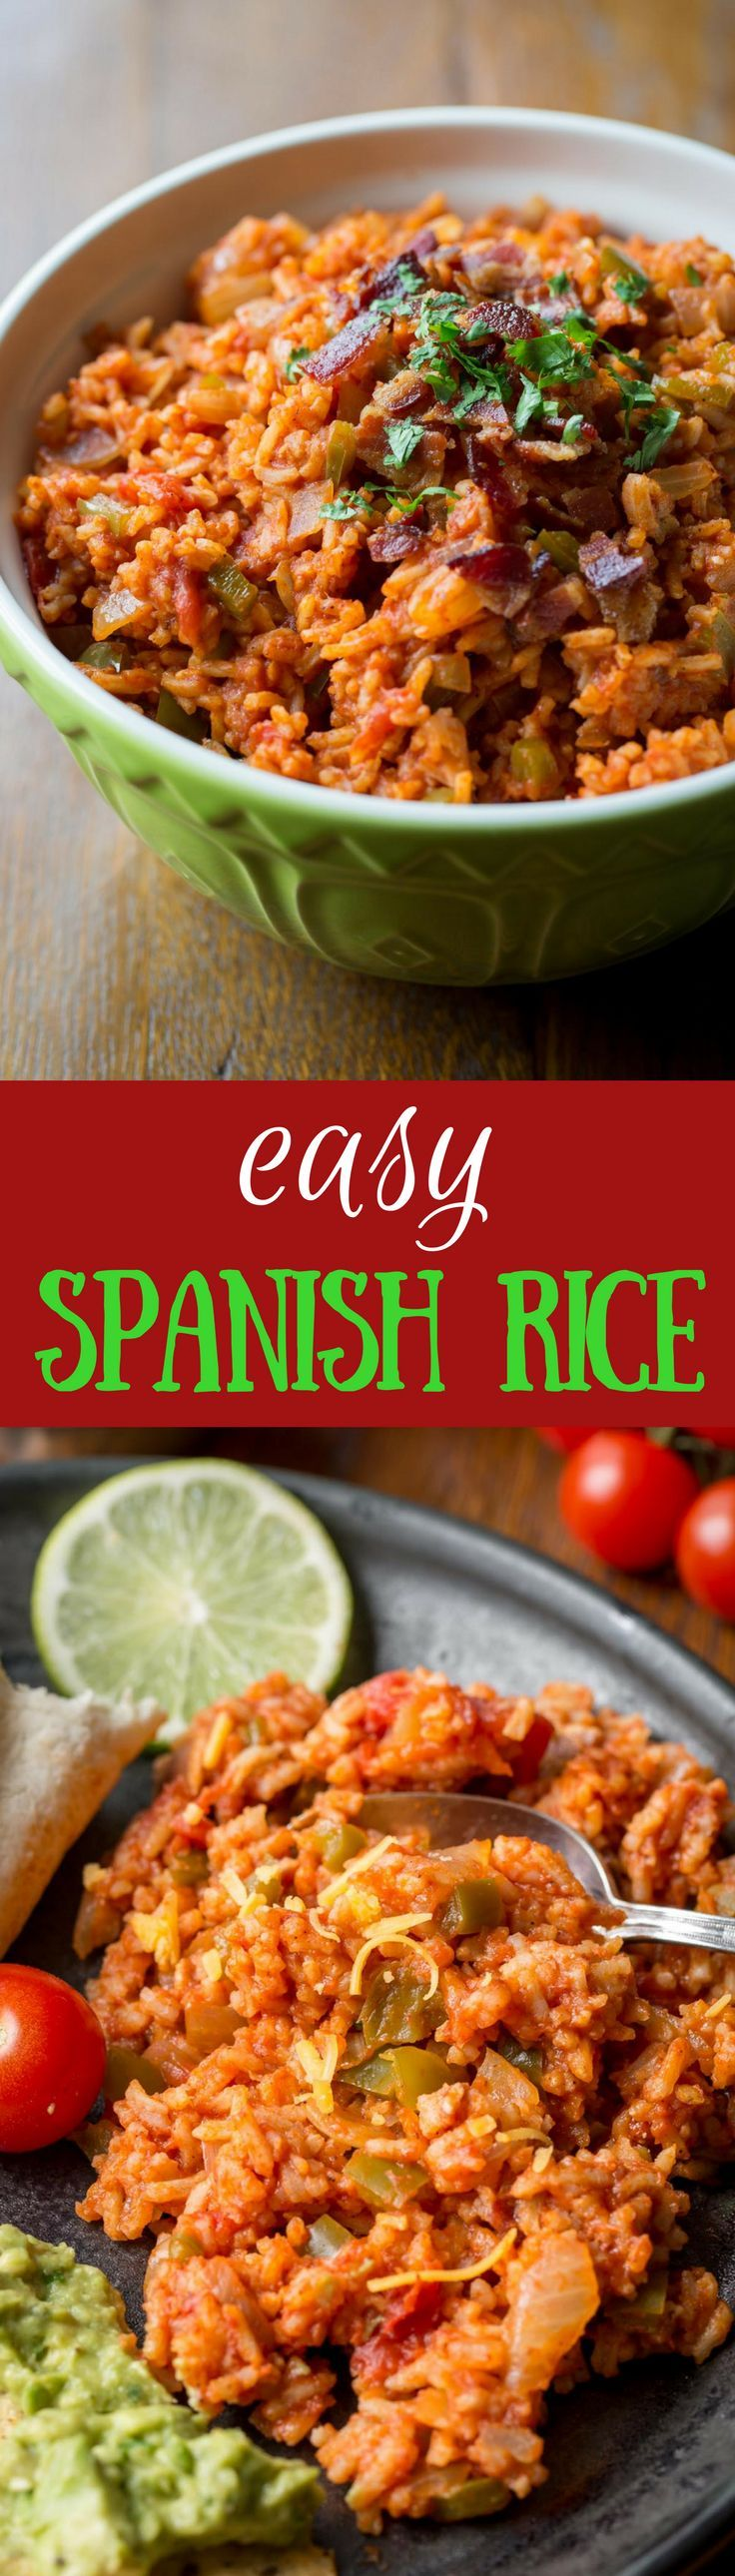 Spanish Rice | Recipe | Spanish rice, Spanish rice recipe ...